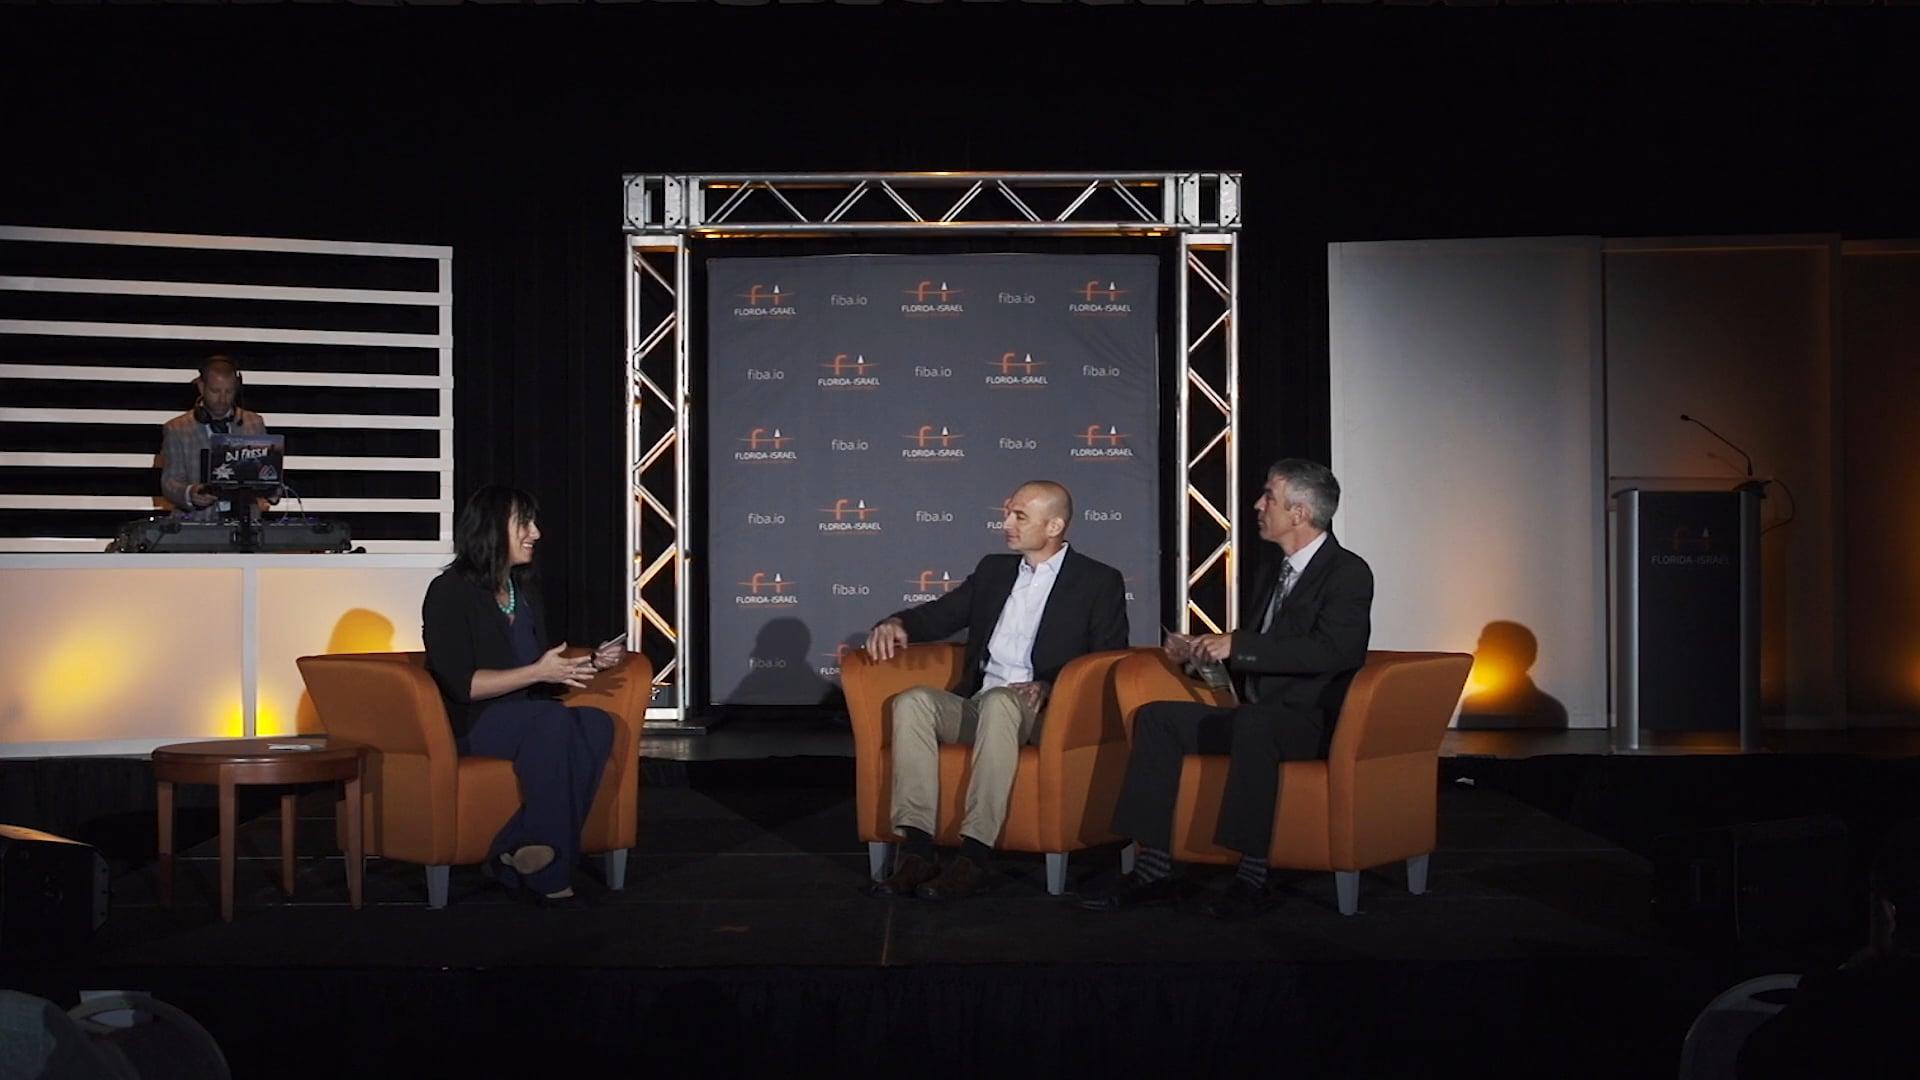 FIBA-Innovation Fusion 2018-Ido Sella/ECOncrete & Chris Cooley/Port Tampa Bay